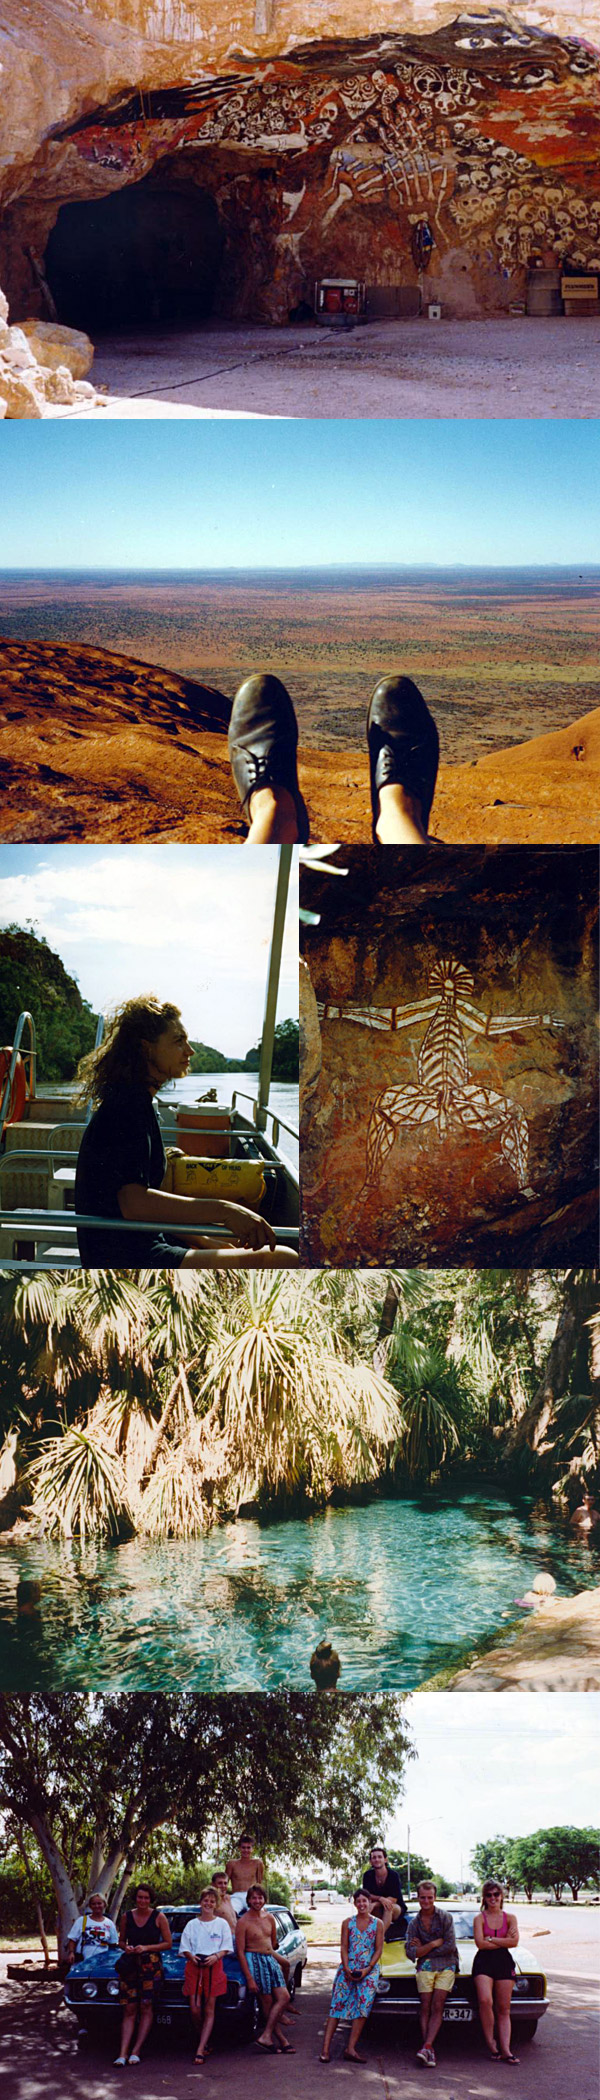 Down on memory lane : Australia 1991